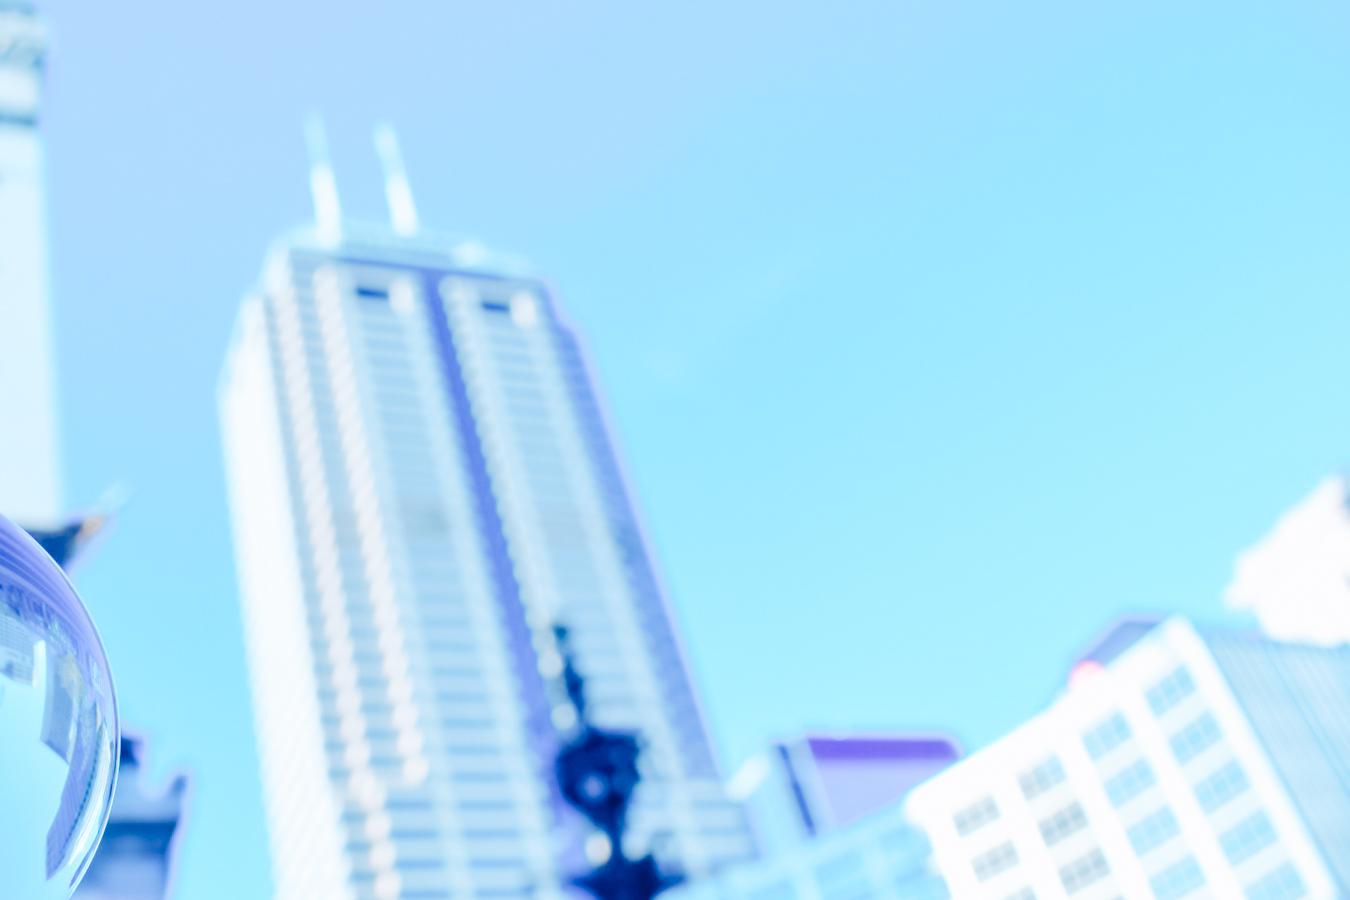 Building in Indianapolis